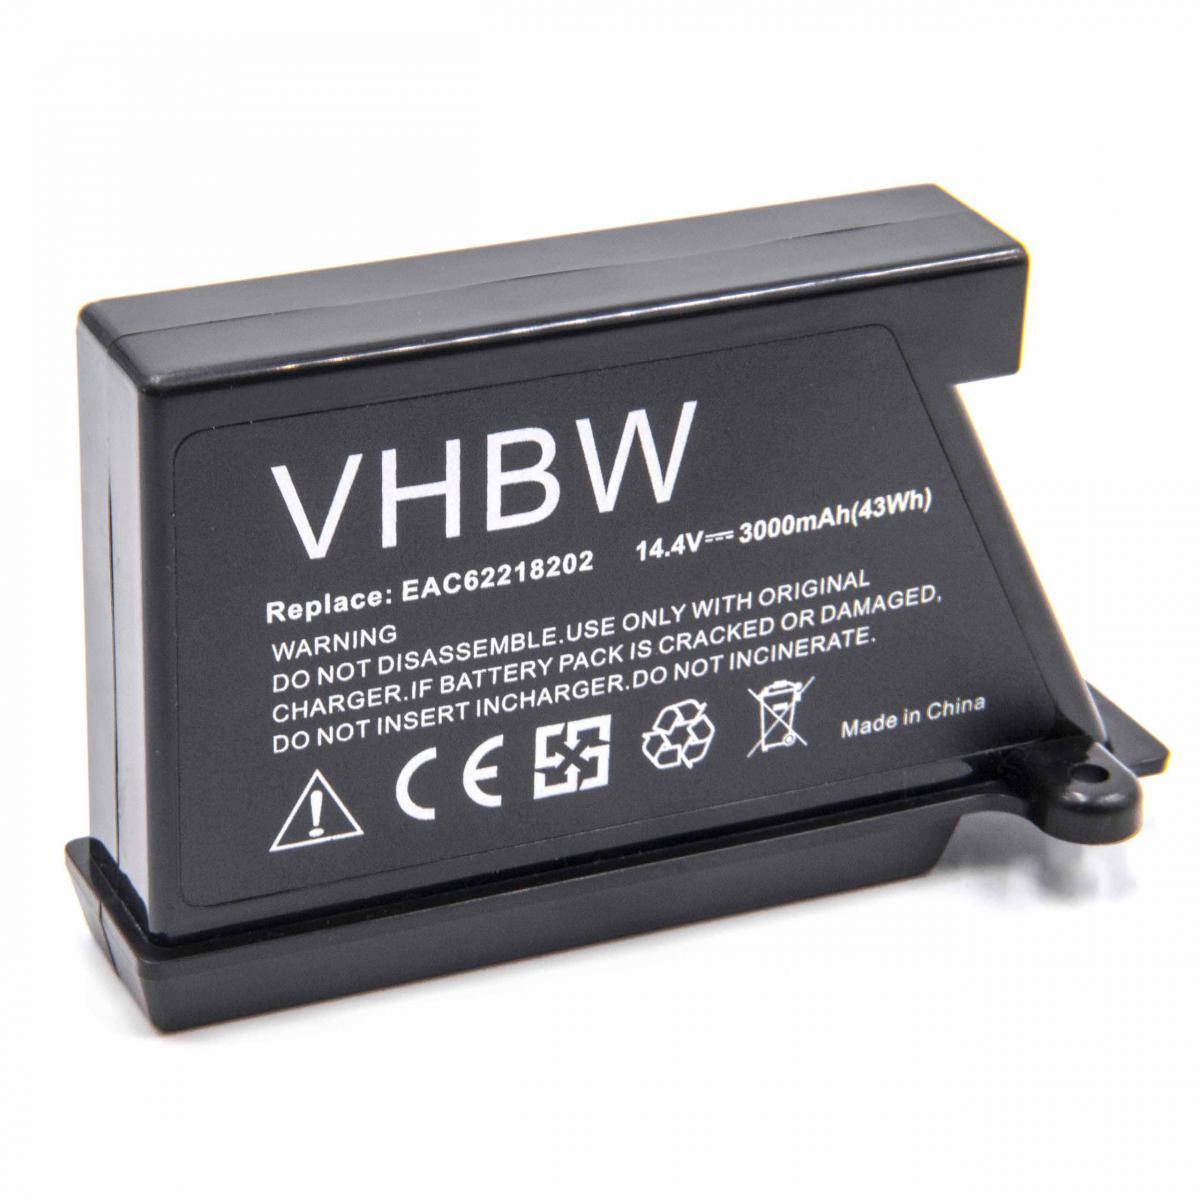 Vhbw vhbw Batterie compatible avec LG HOM-BOT VR66801VMIP, VR66802VMWP, VR7412RB robot électroménager (3000mAh, 14,4V, Li-ion